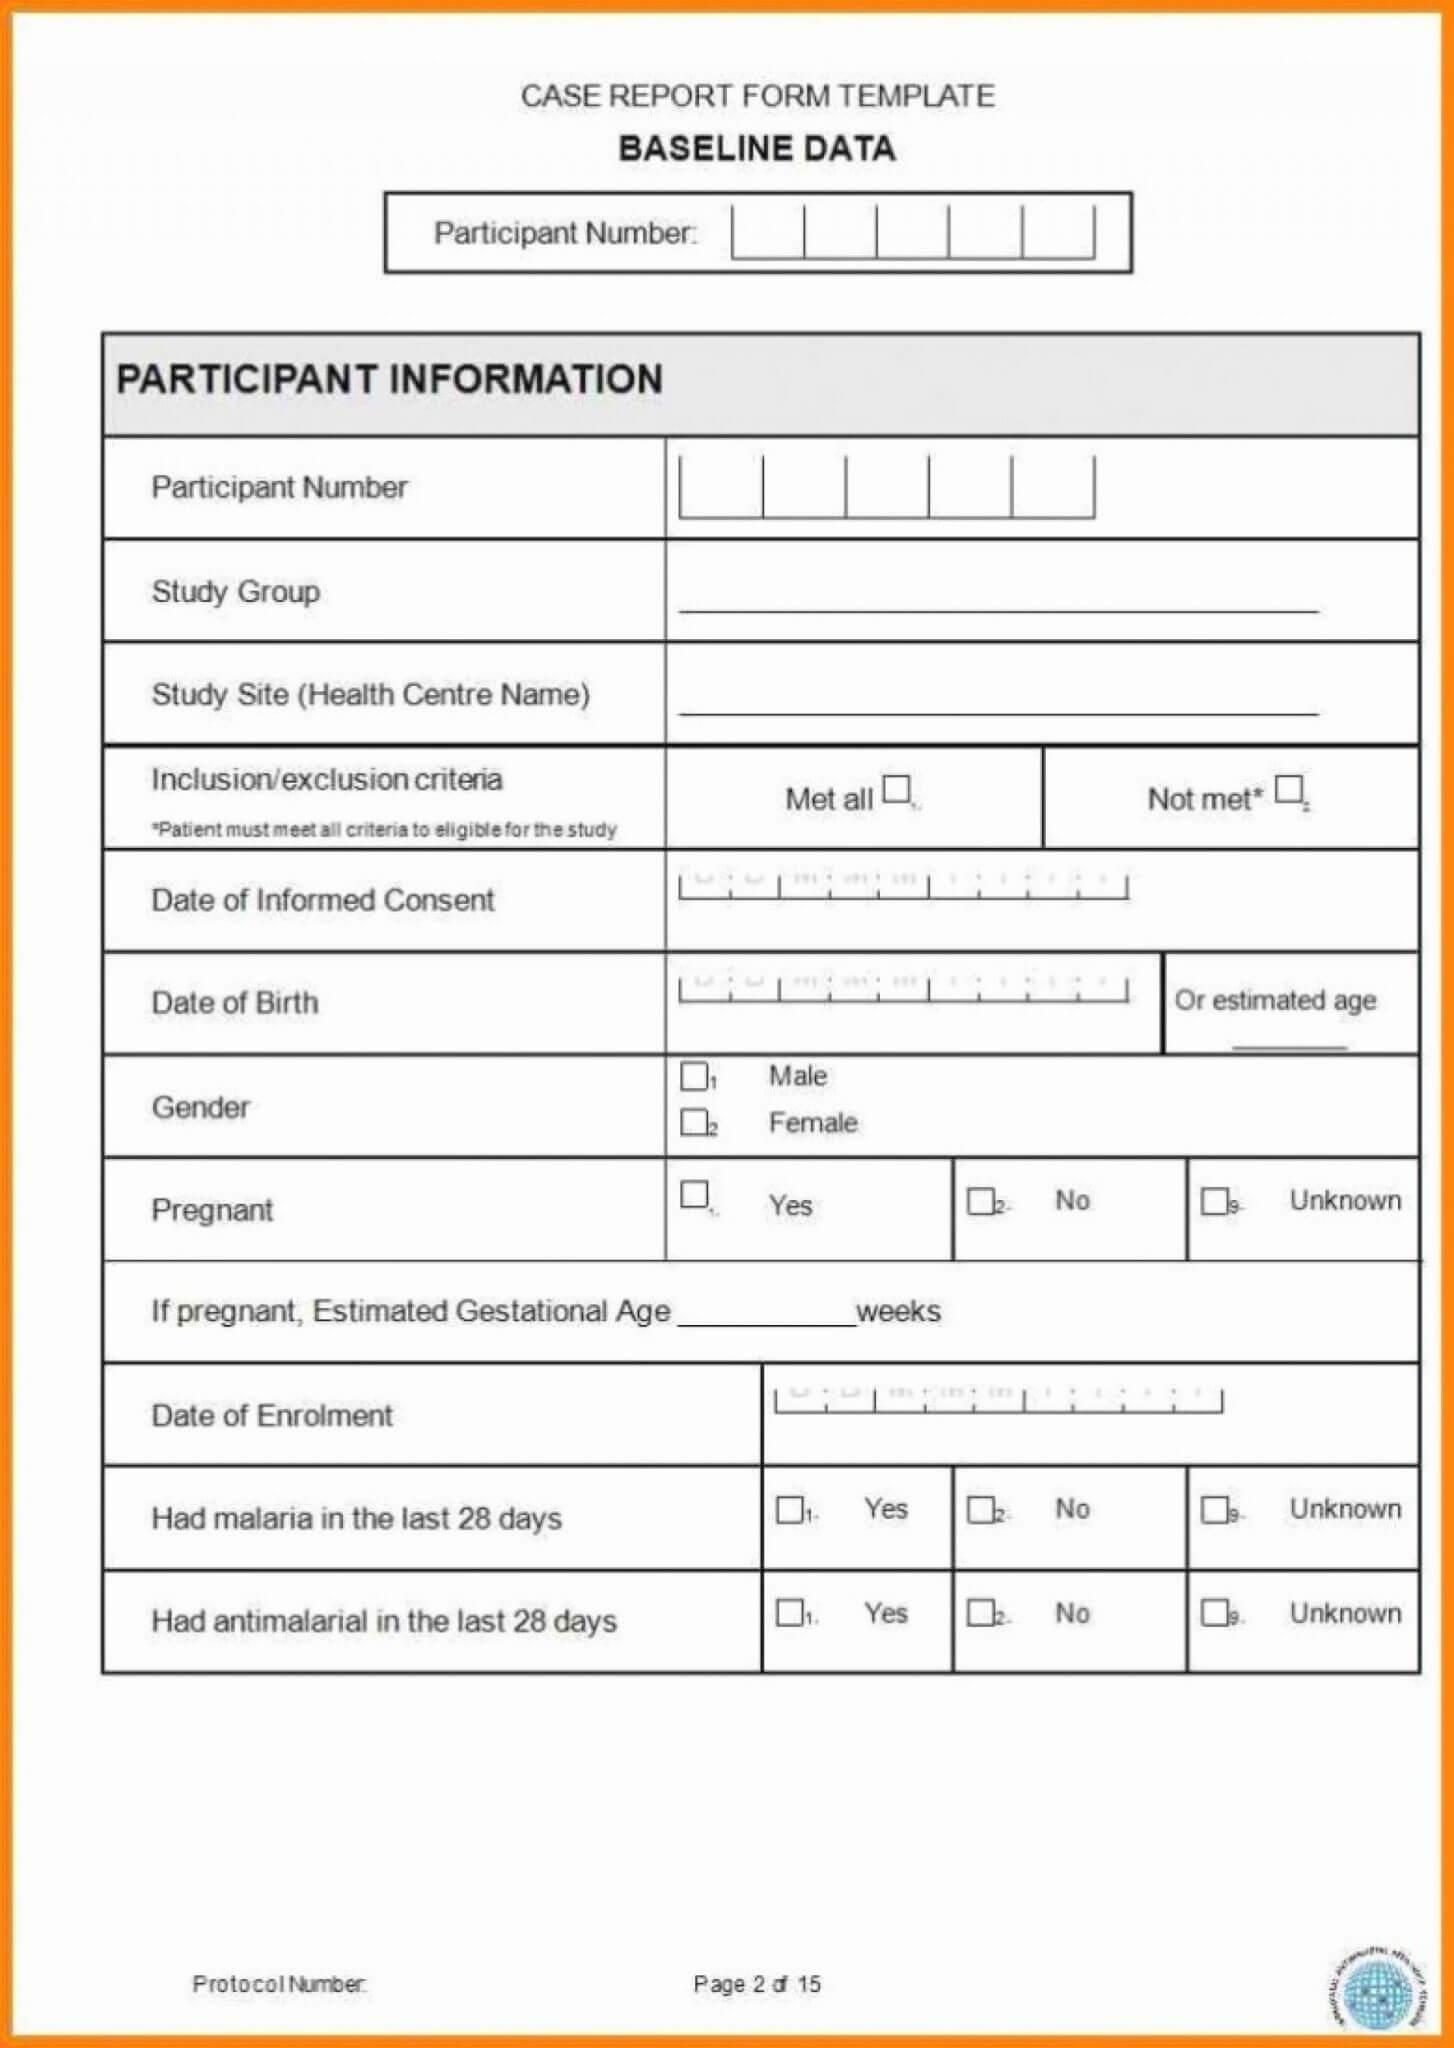 Case Report Form Template Unique Catering Resume Clinical Throughout Case Report Form Template Clinical Trials